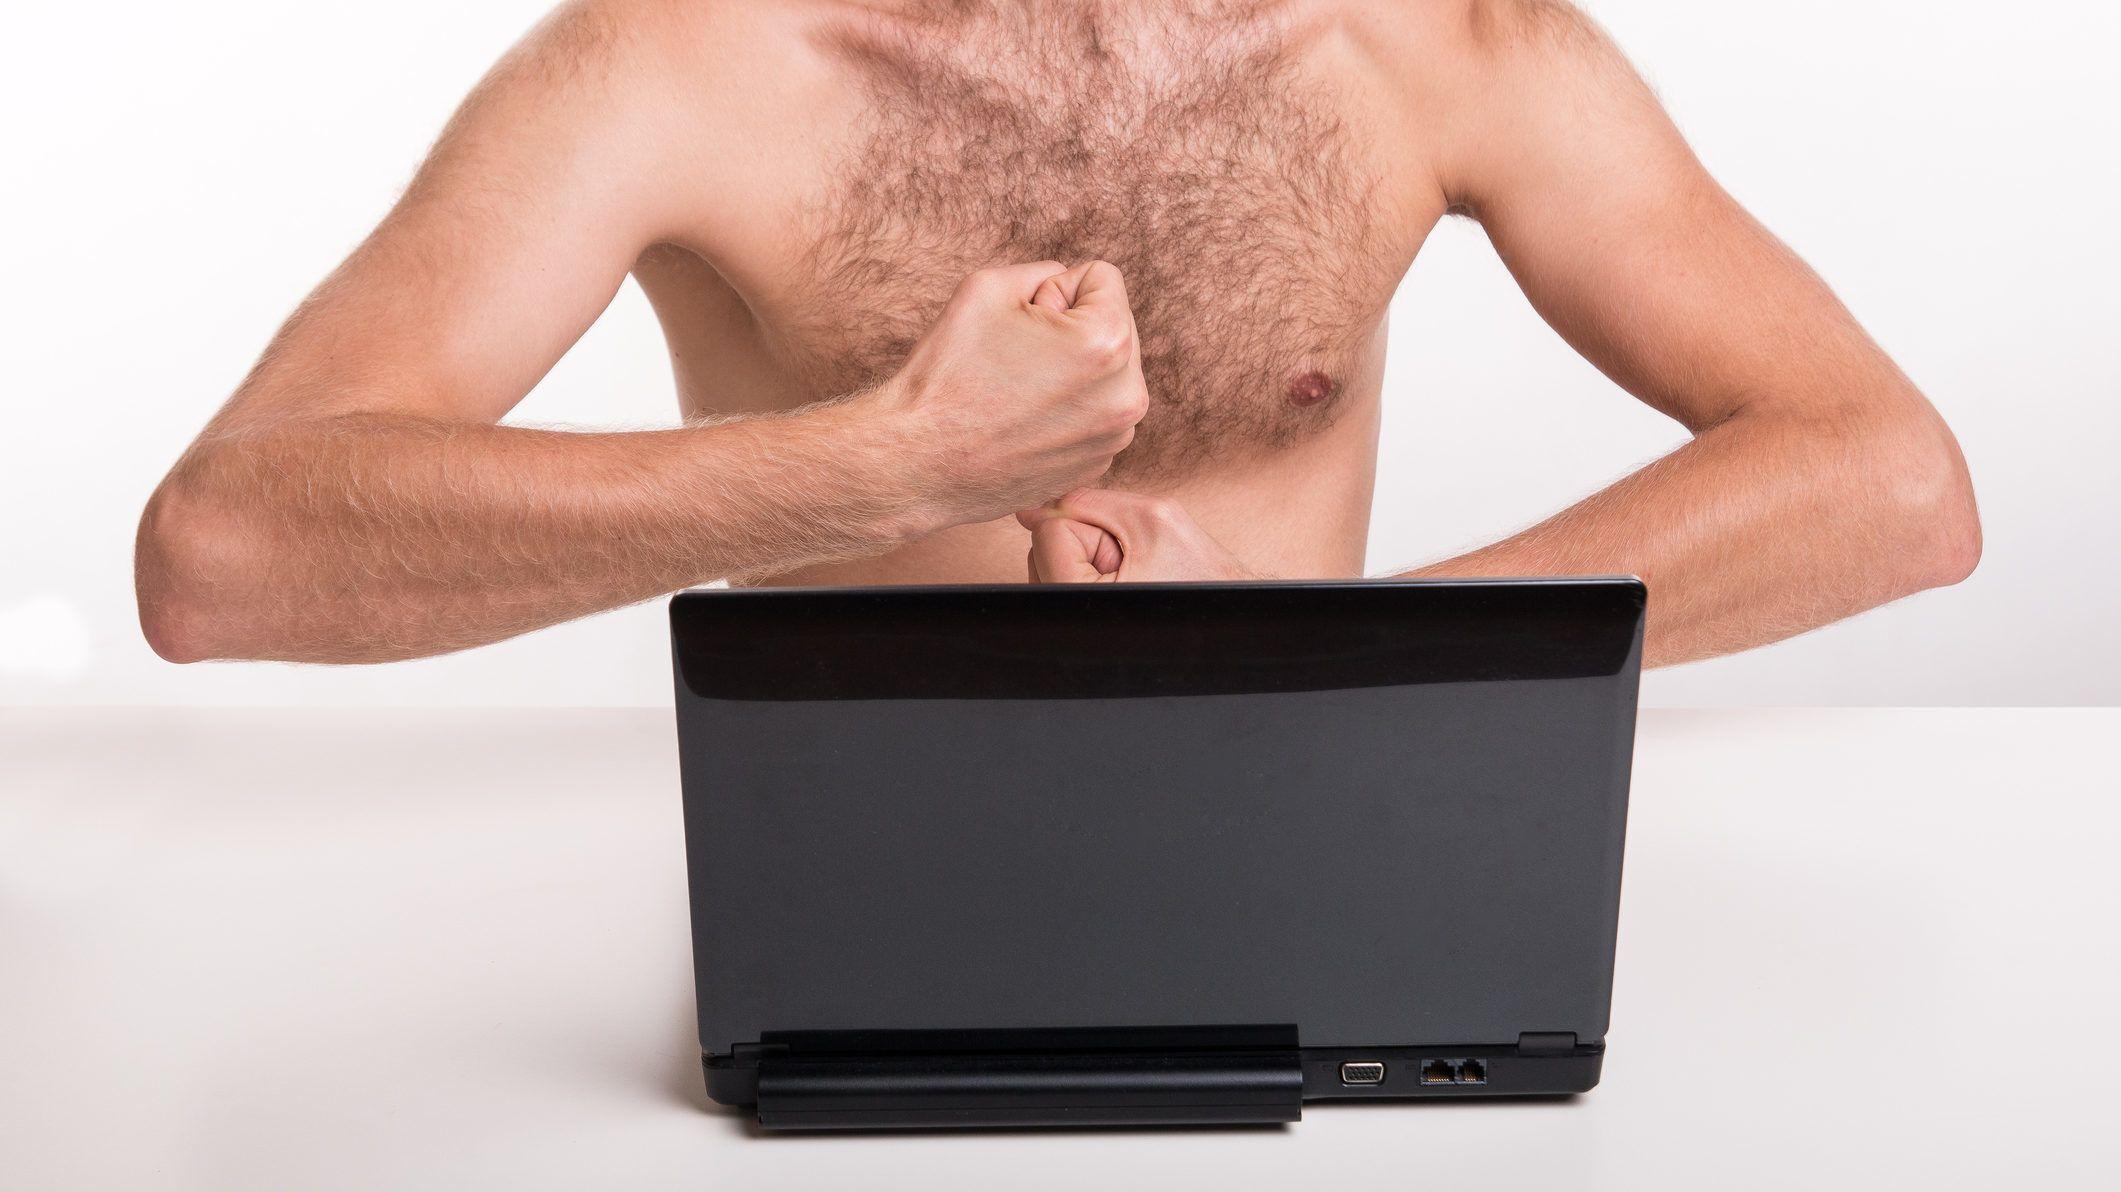 zsarolás pornó afrikai tini Creampie